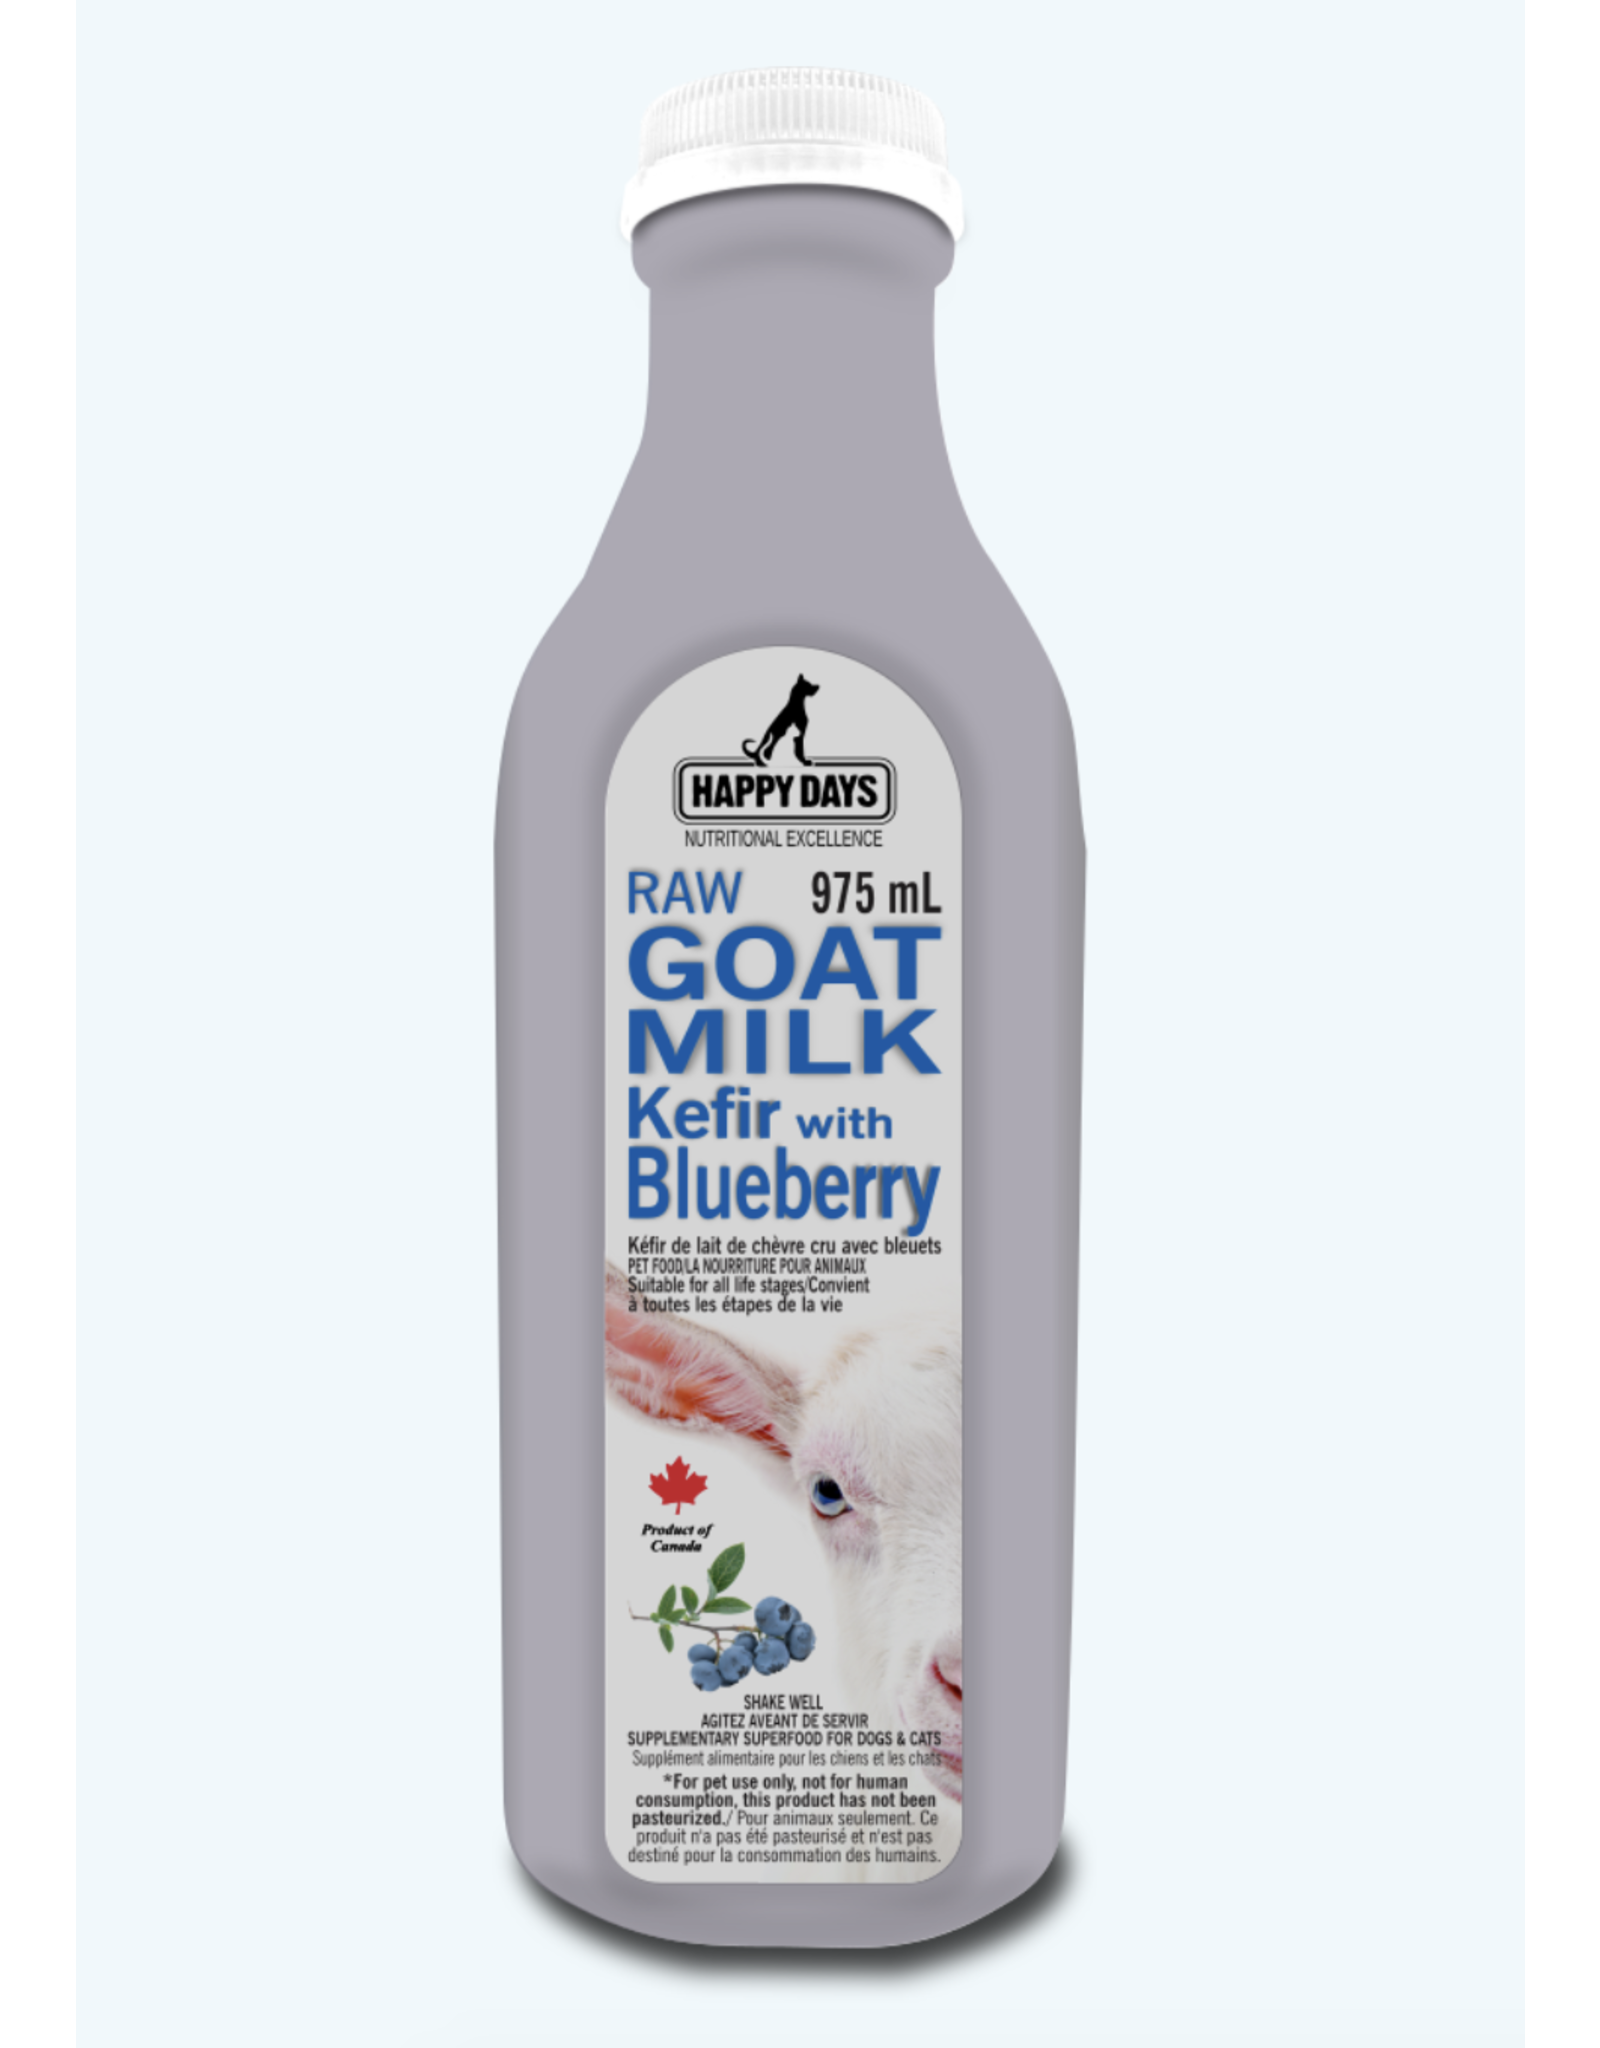 Happy Days Happy Days - Raw Goat Milk Kefir with Blueberries - 1L